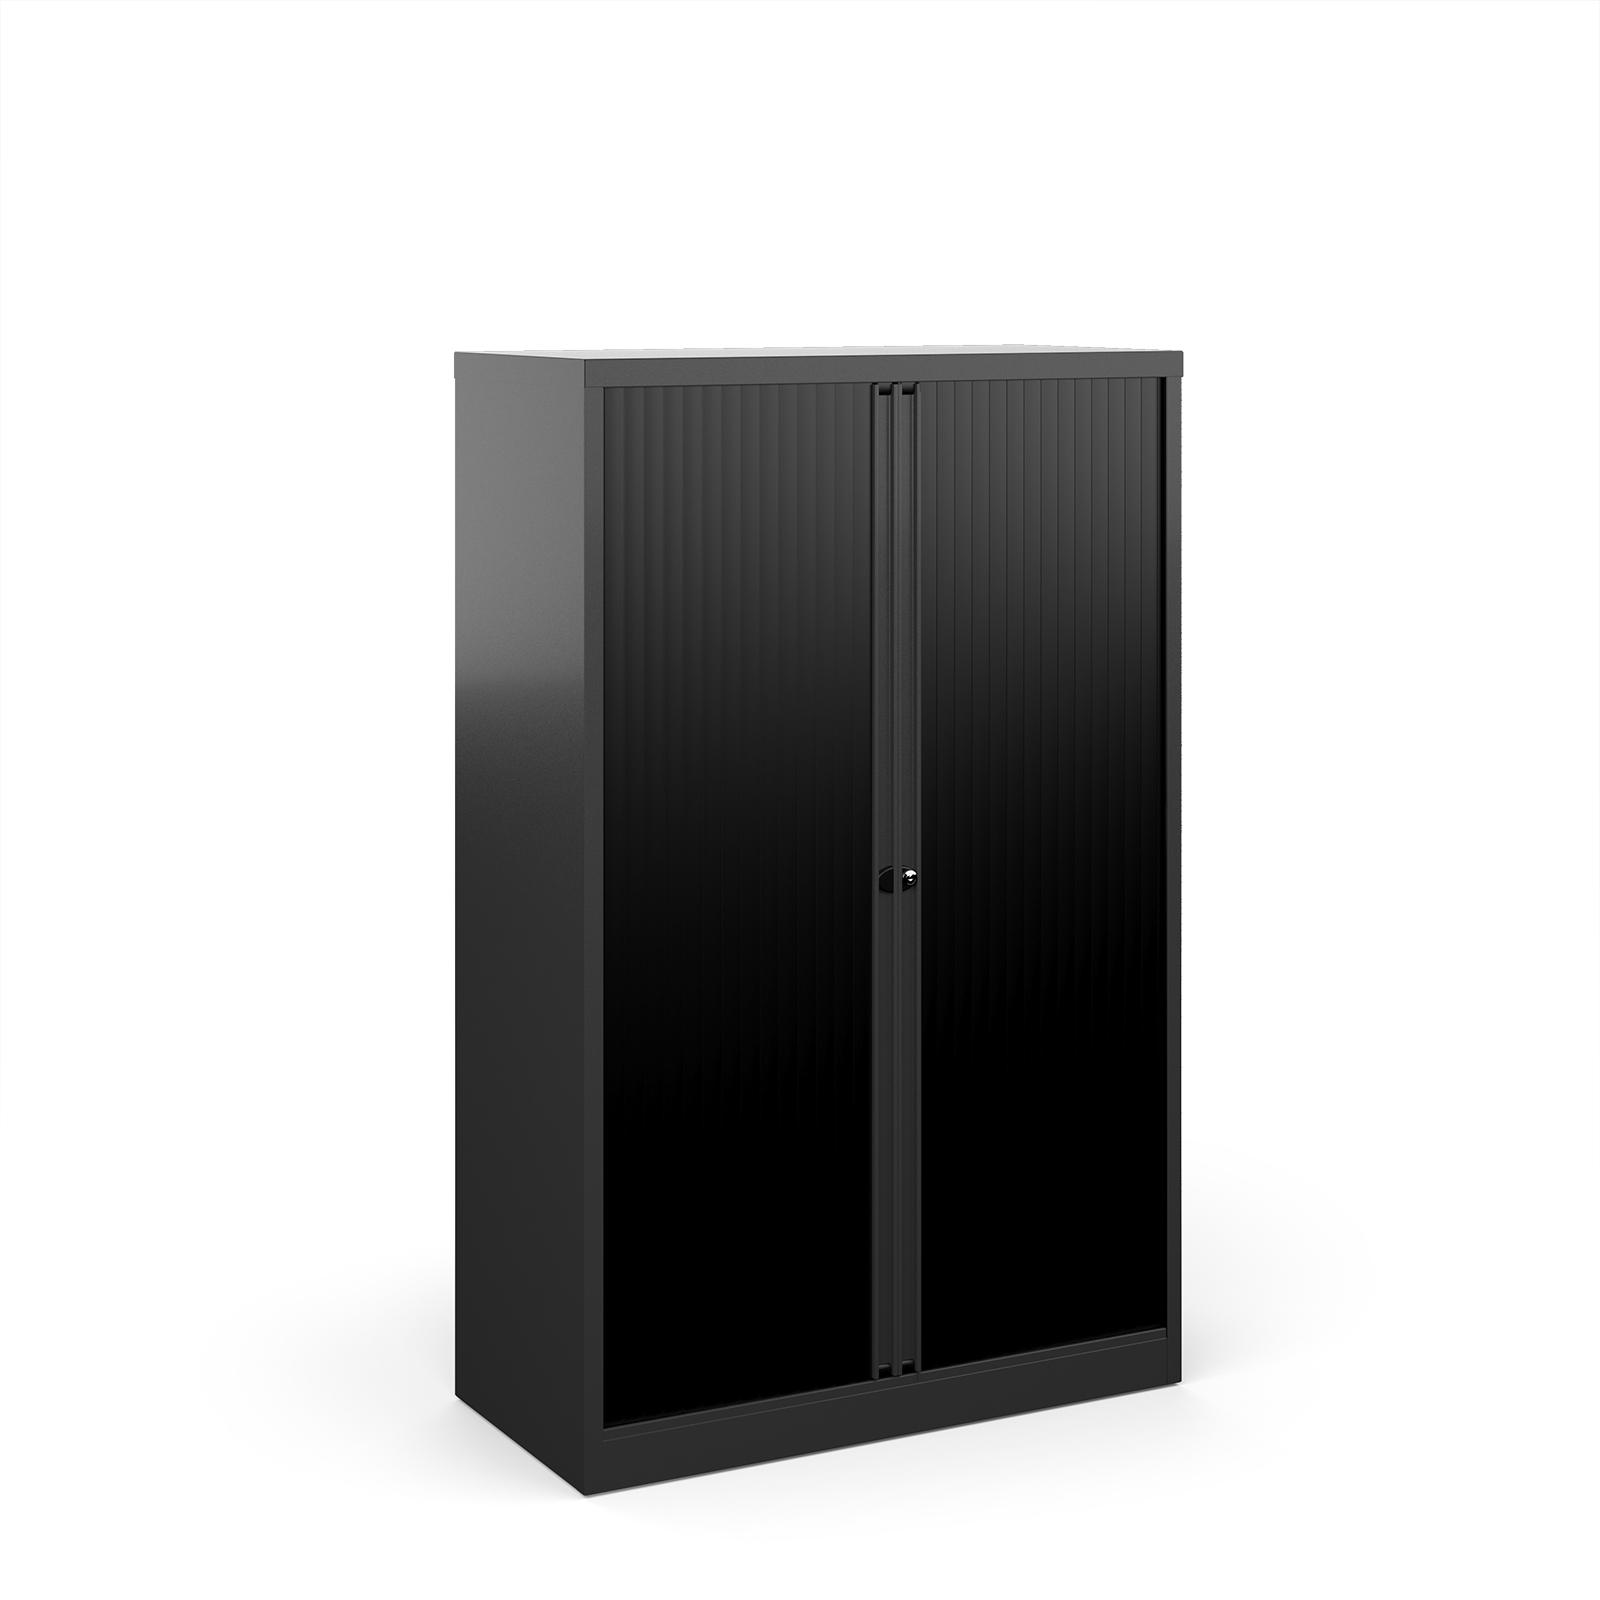 Over 1200mm High Bisley systems storage medium tambour cupboard 1570mm high - black